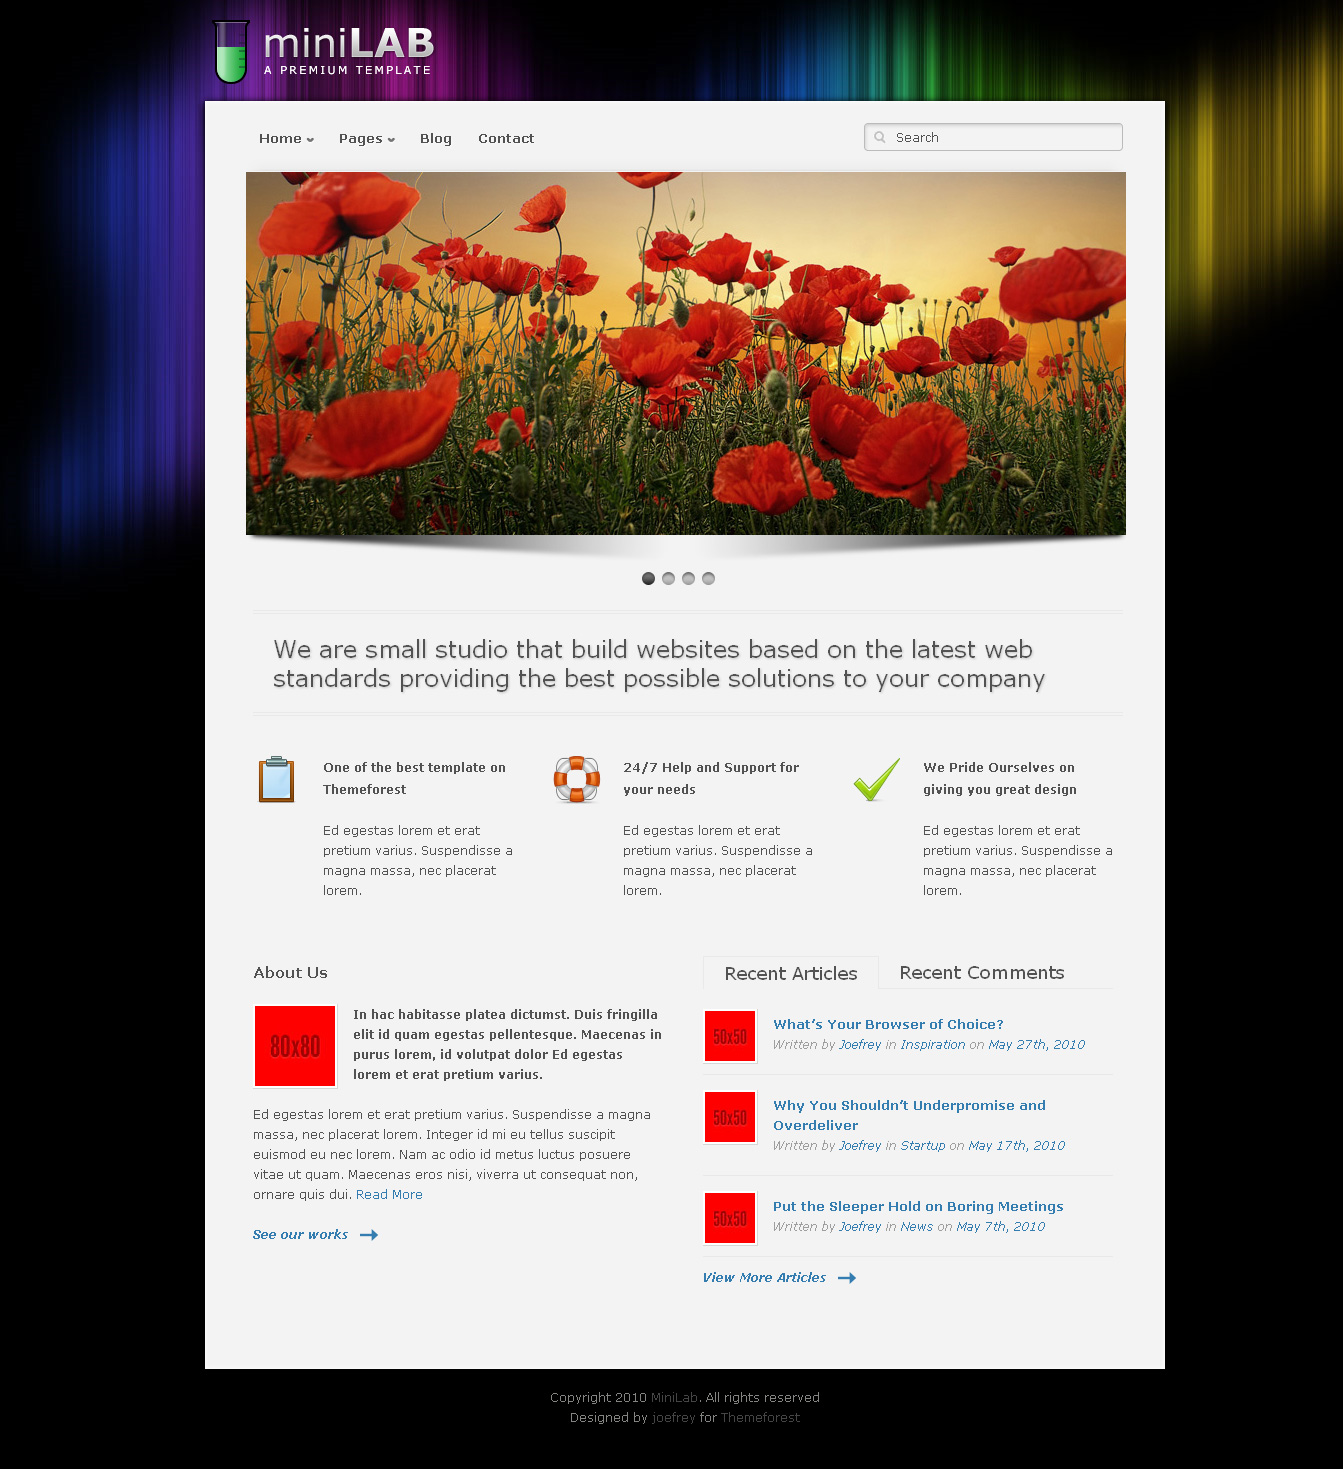 Mini Lab - Premium Wordpress Theme 15 in 1